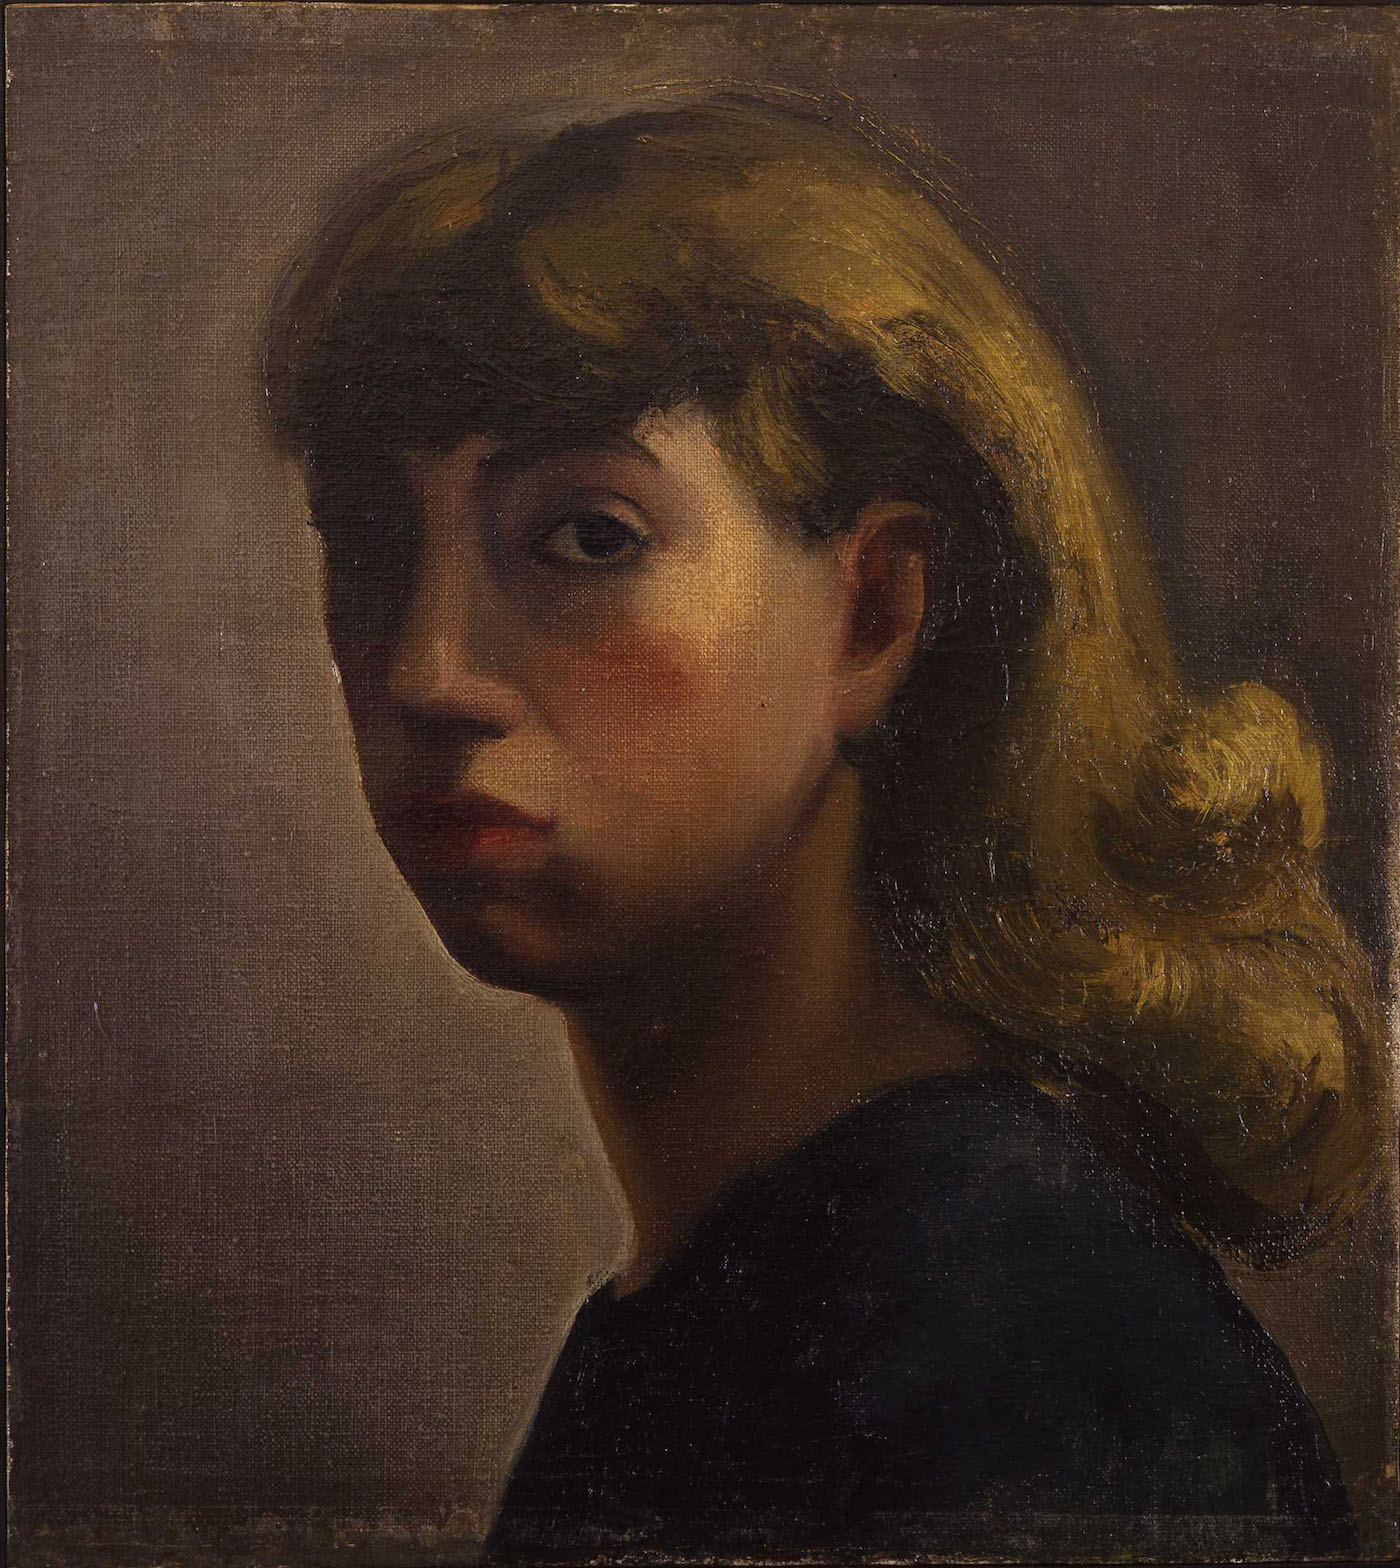 Lee krasner self portrait c 1931 33 oil on linen 18 x 16